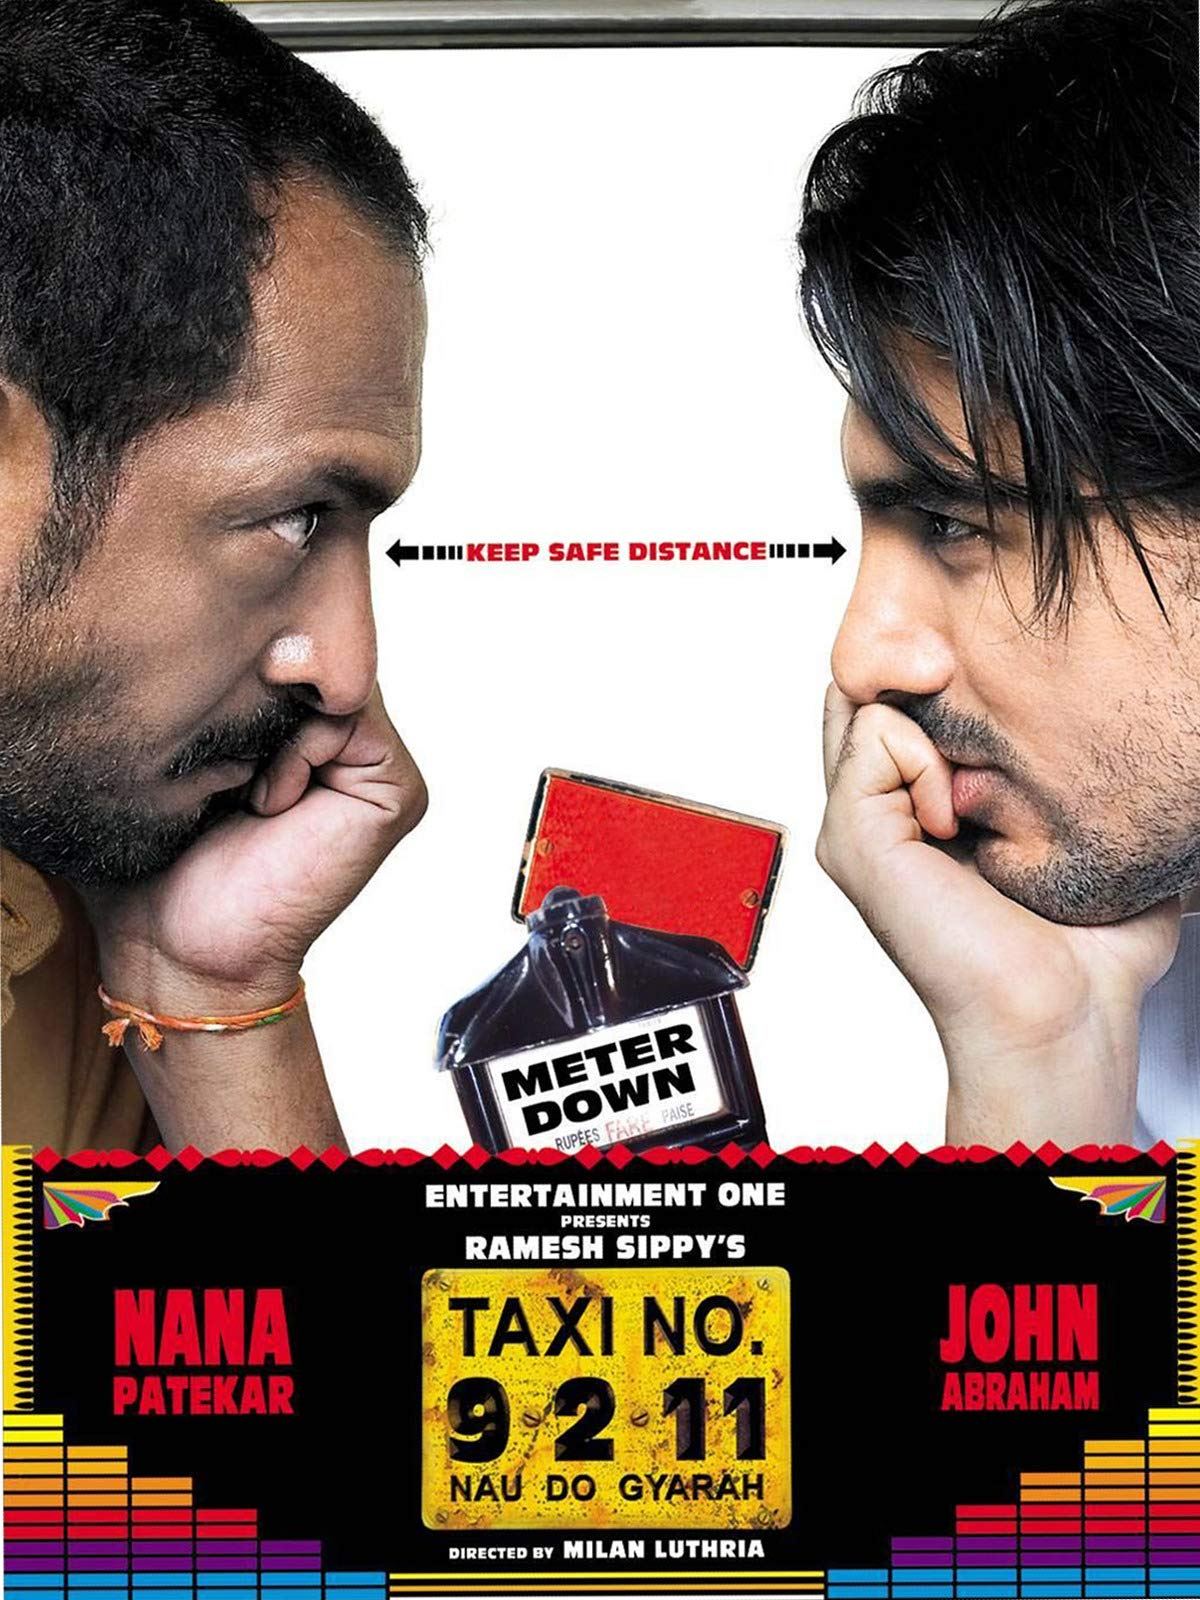 Taxi No. 9 2 11: Nau Do Gyarah